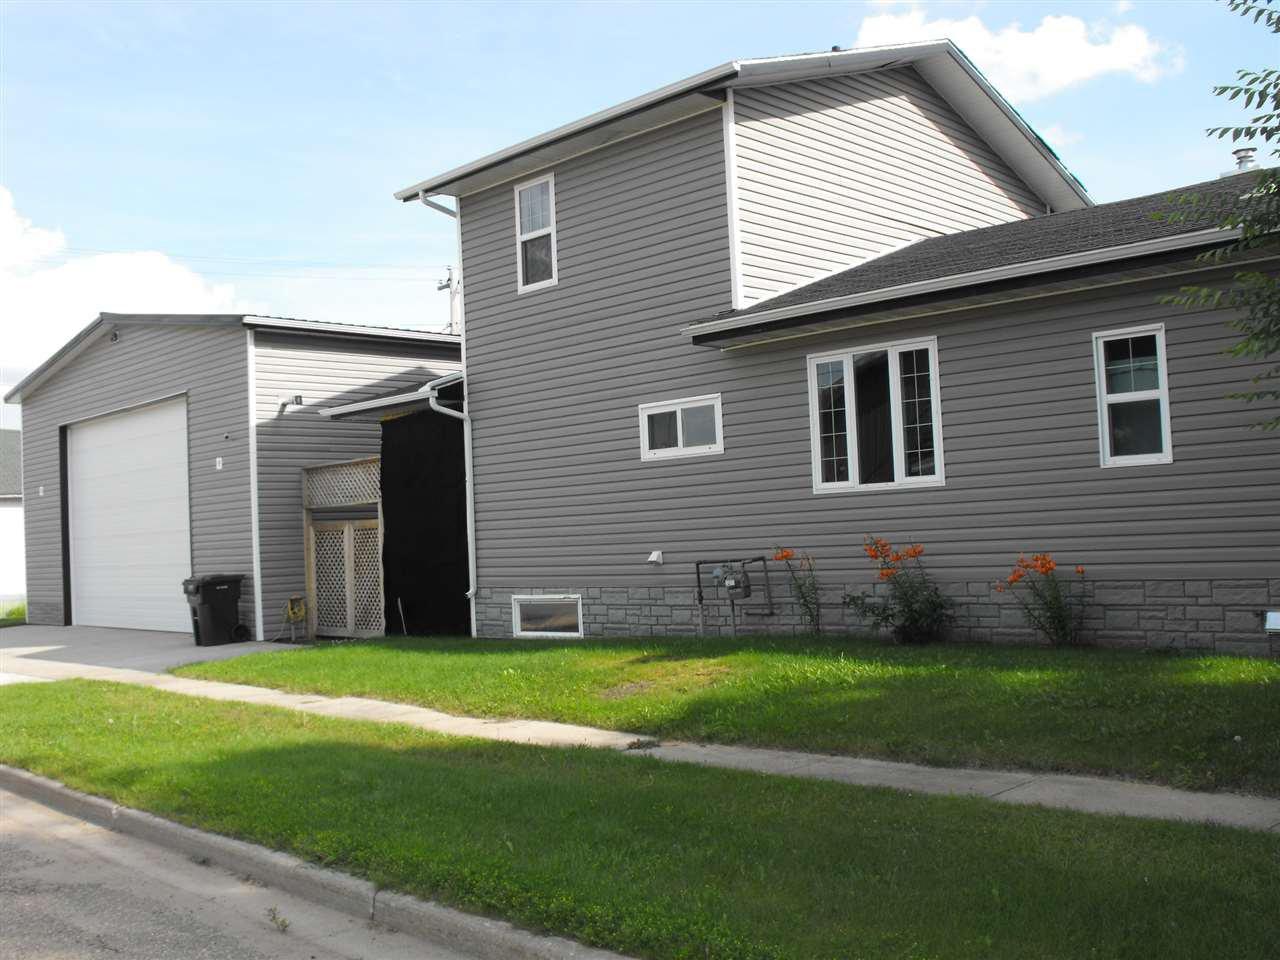 Main Photo: 4833 52 Street: Elk Point House for sale : MLS®# E4171801